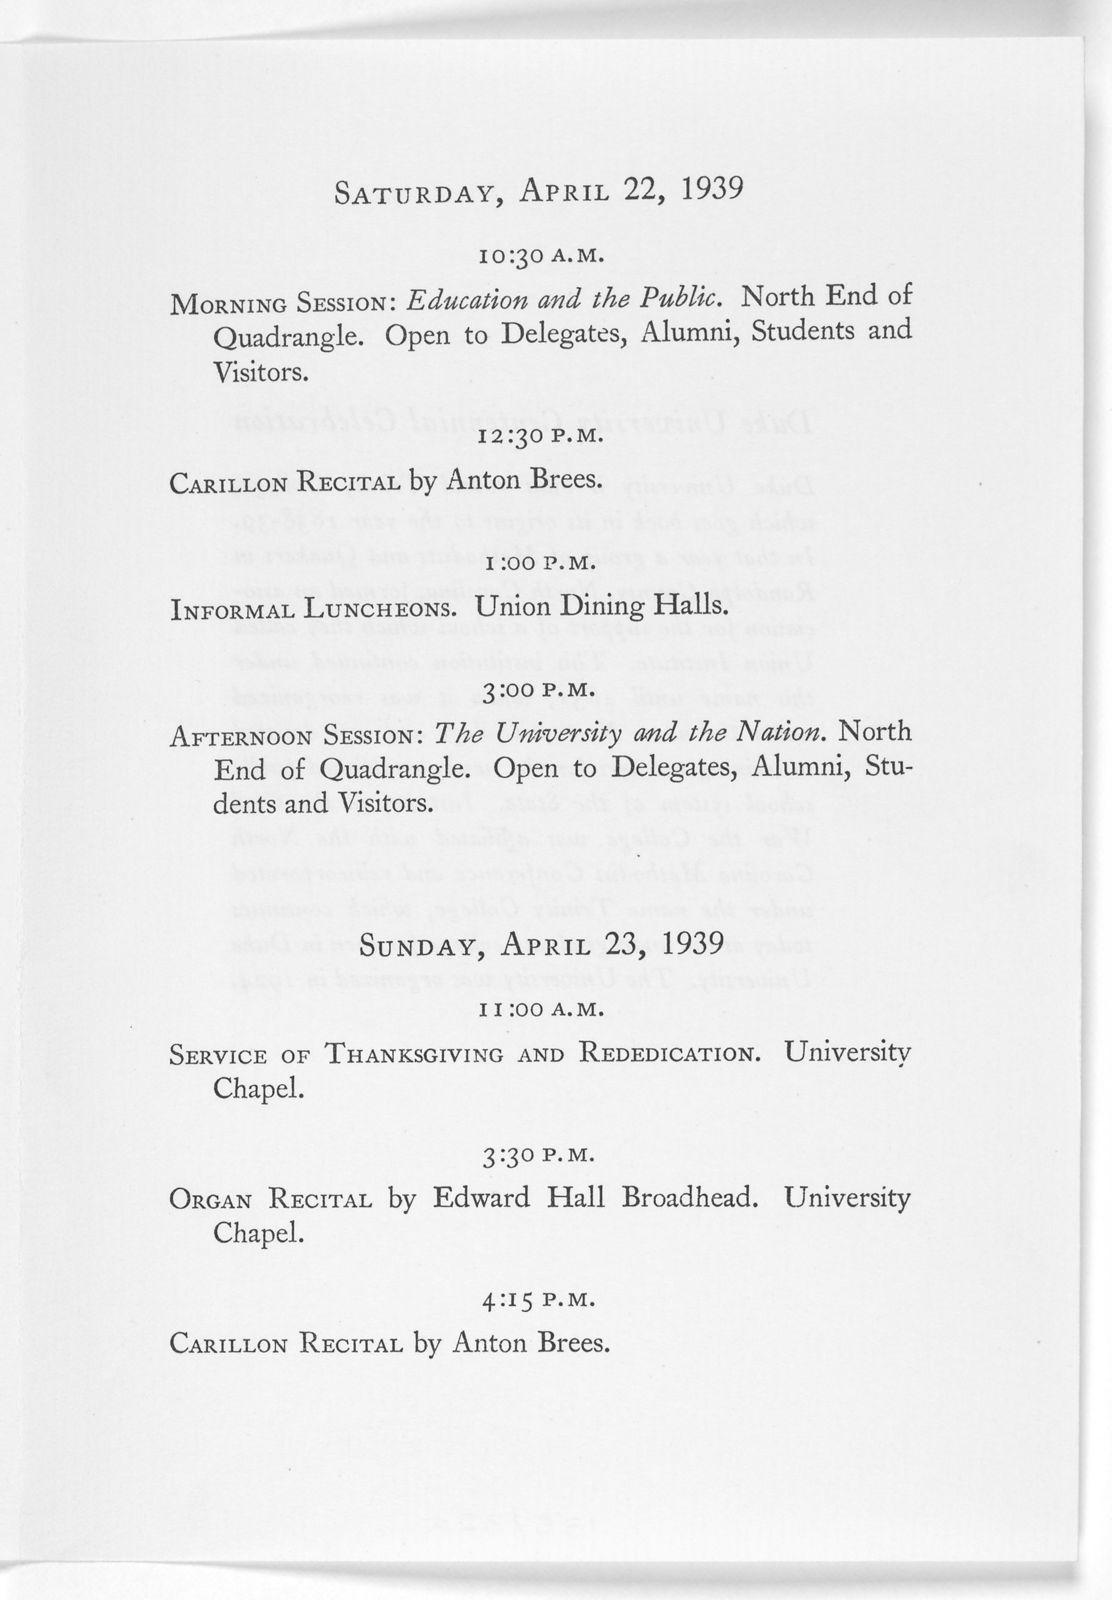 Duke University centennial celebration Trinity College- Duke University 1838-1839-1938-1939. Preliminary program of the centennial celebration April 21, 22 and 23, 1939. Durham, N. C. [1939].